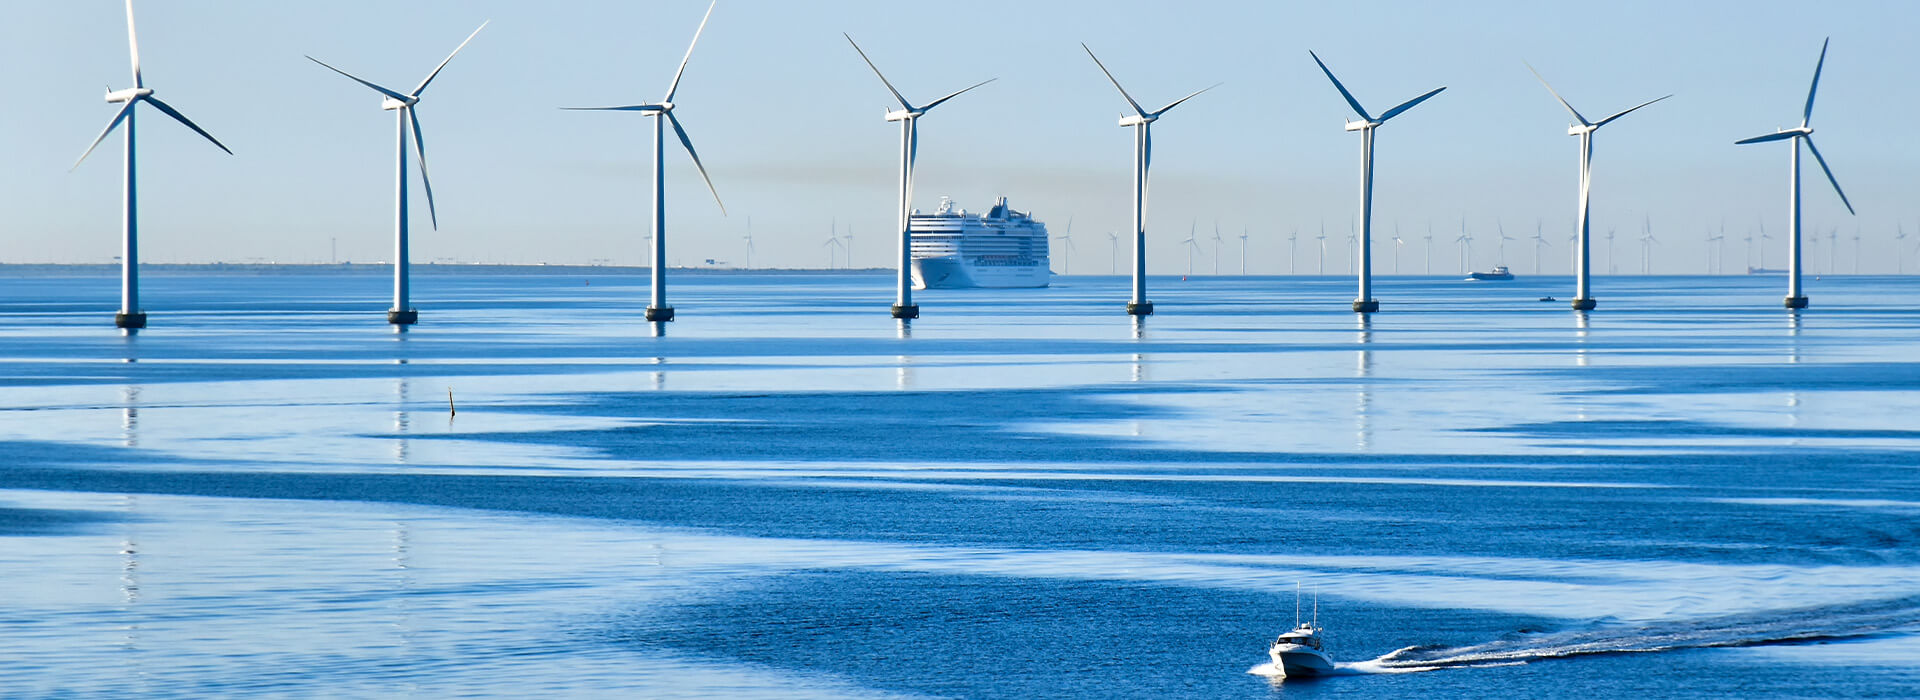 Ocean windmills